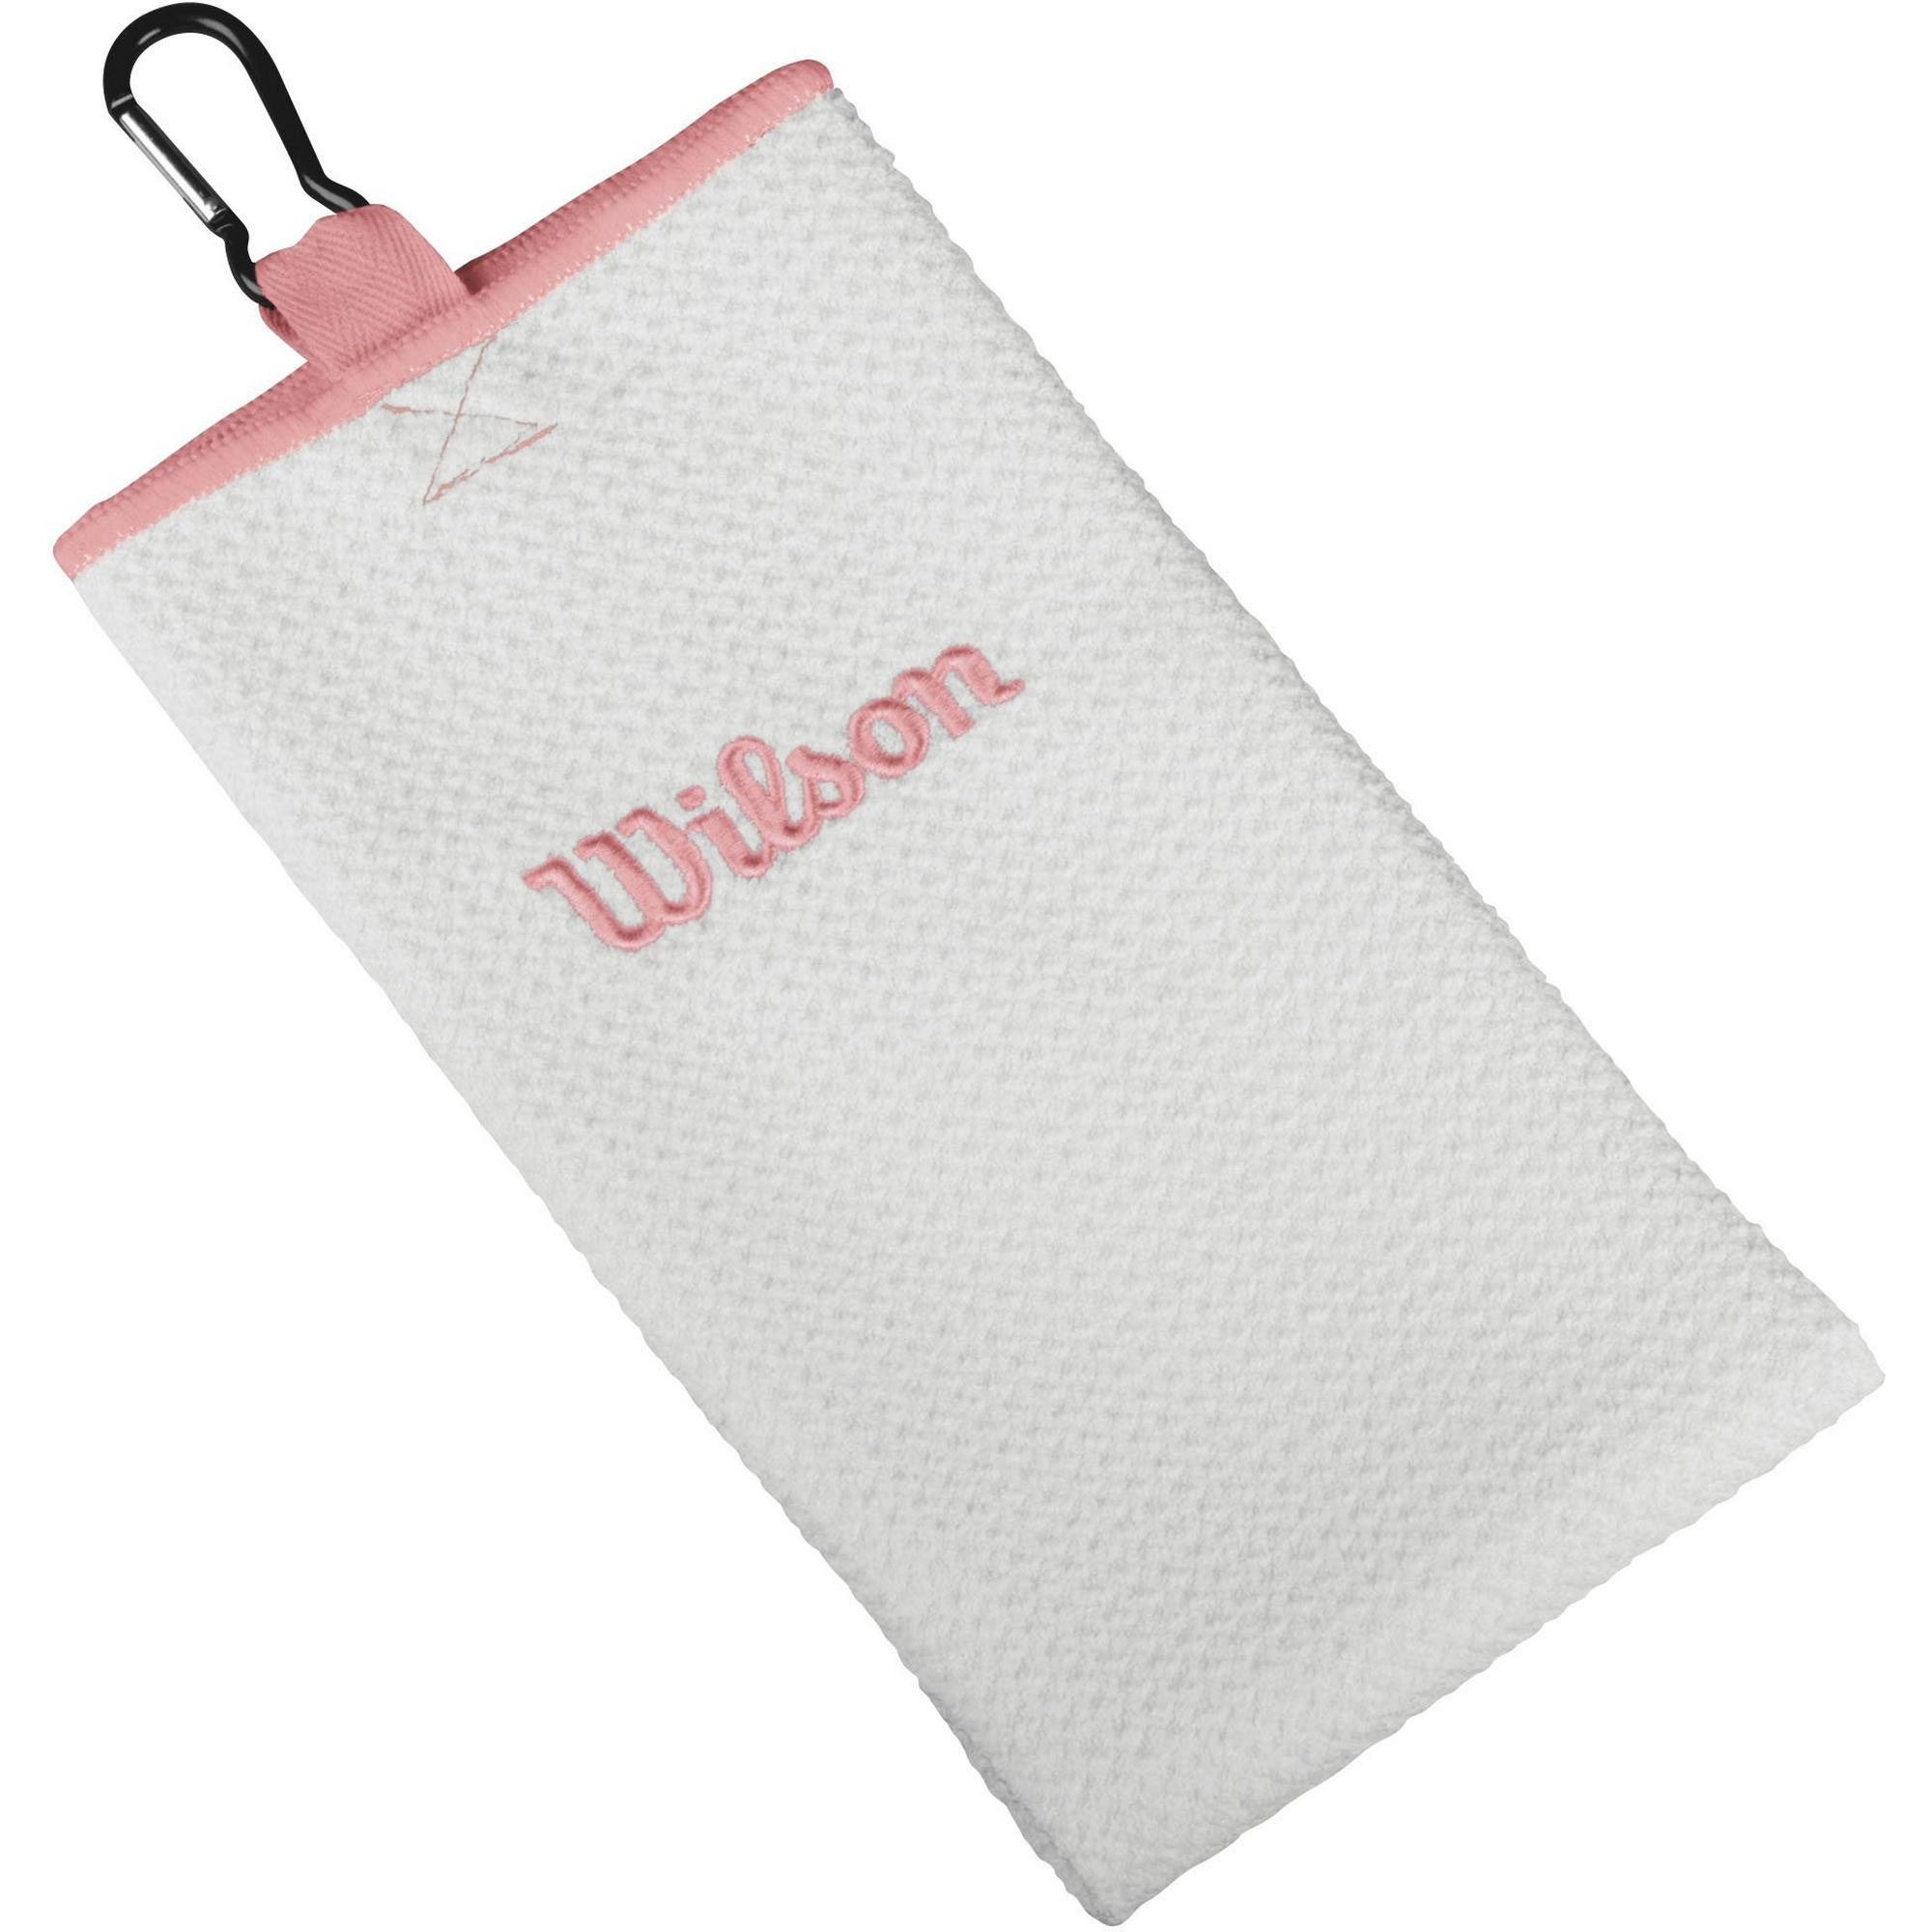 Wilson Microfiber Trifold Towel - Pink